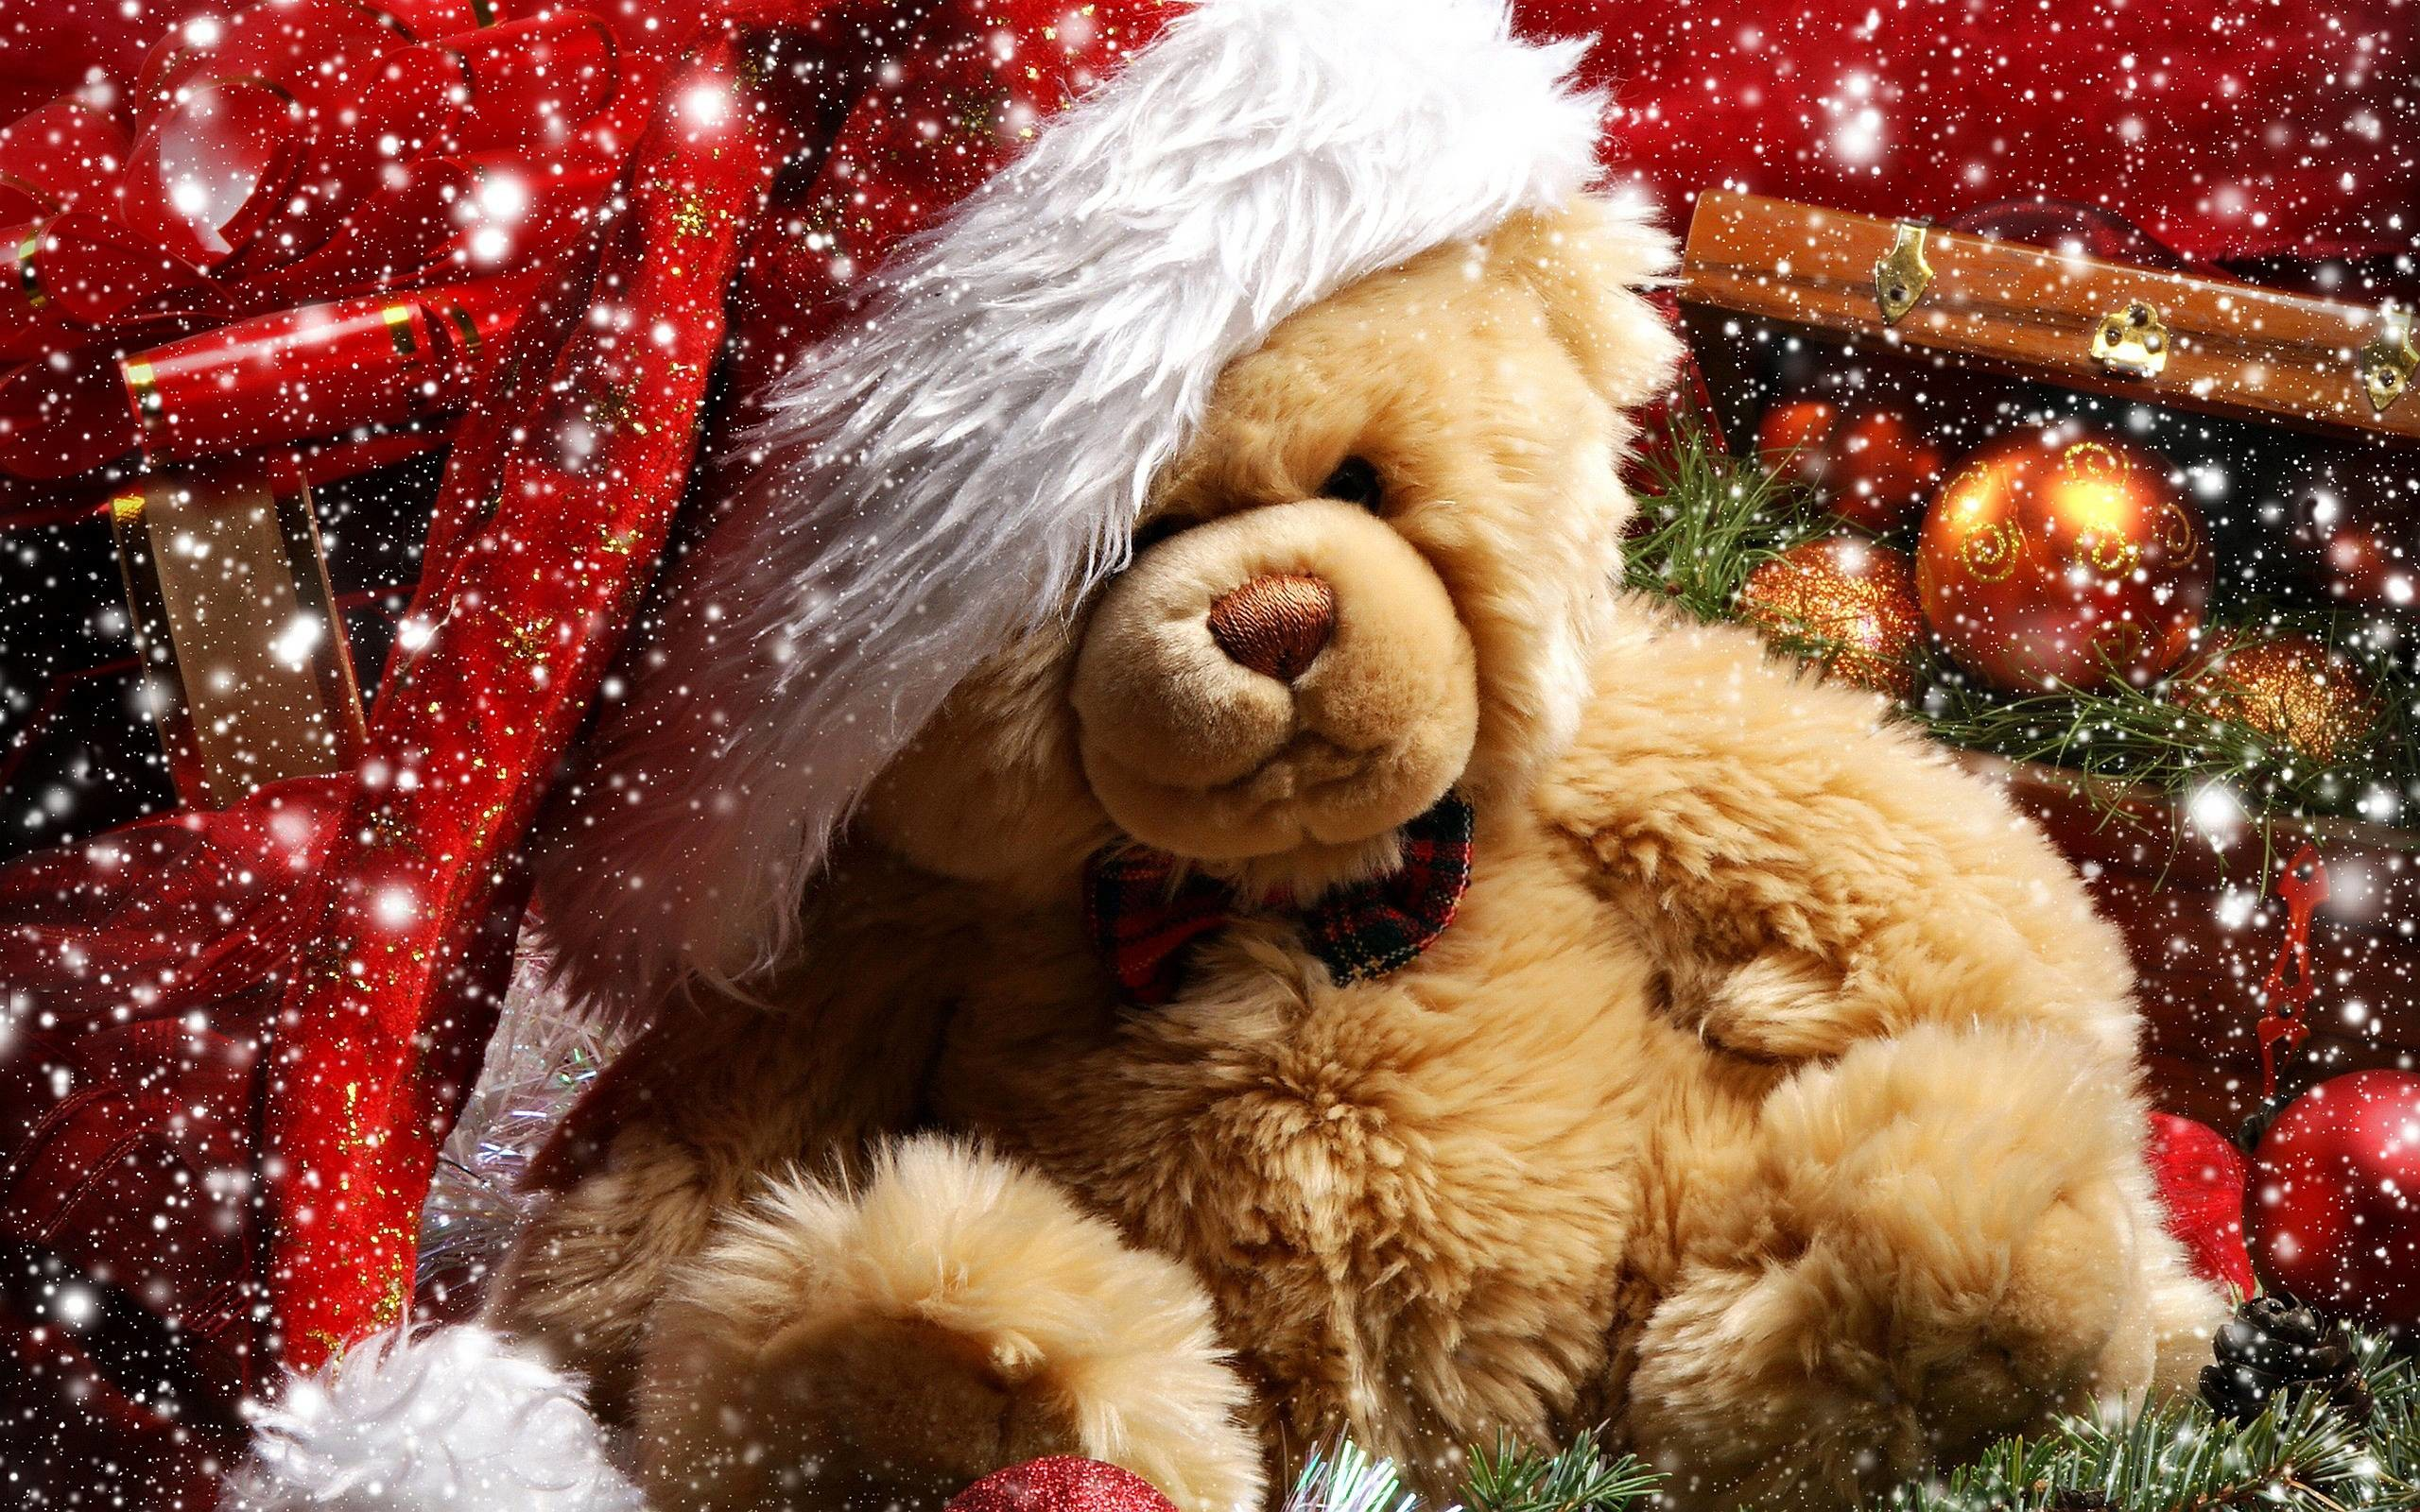 Cute Teddy Bear Wallpaper 50 Images